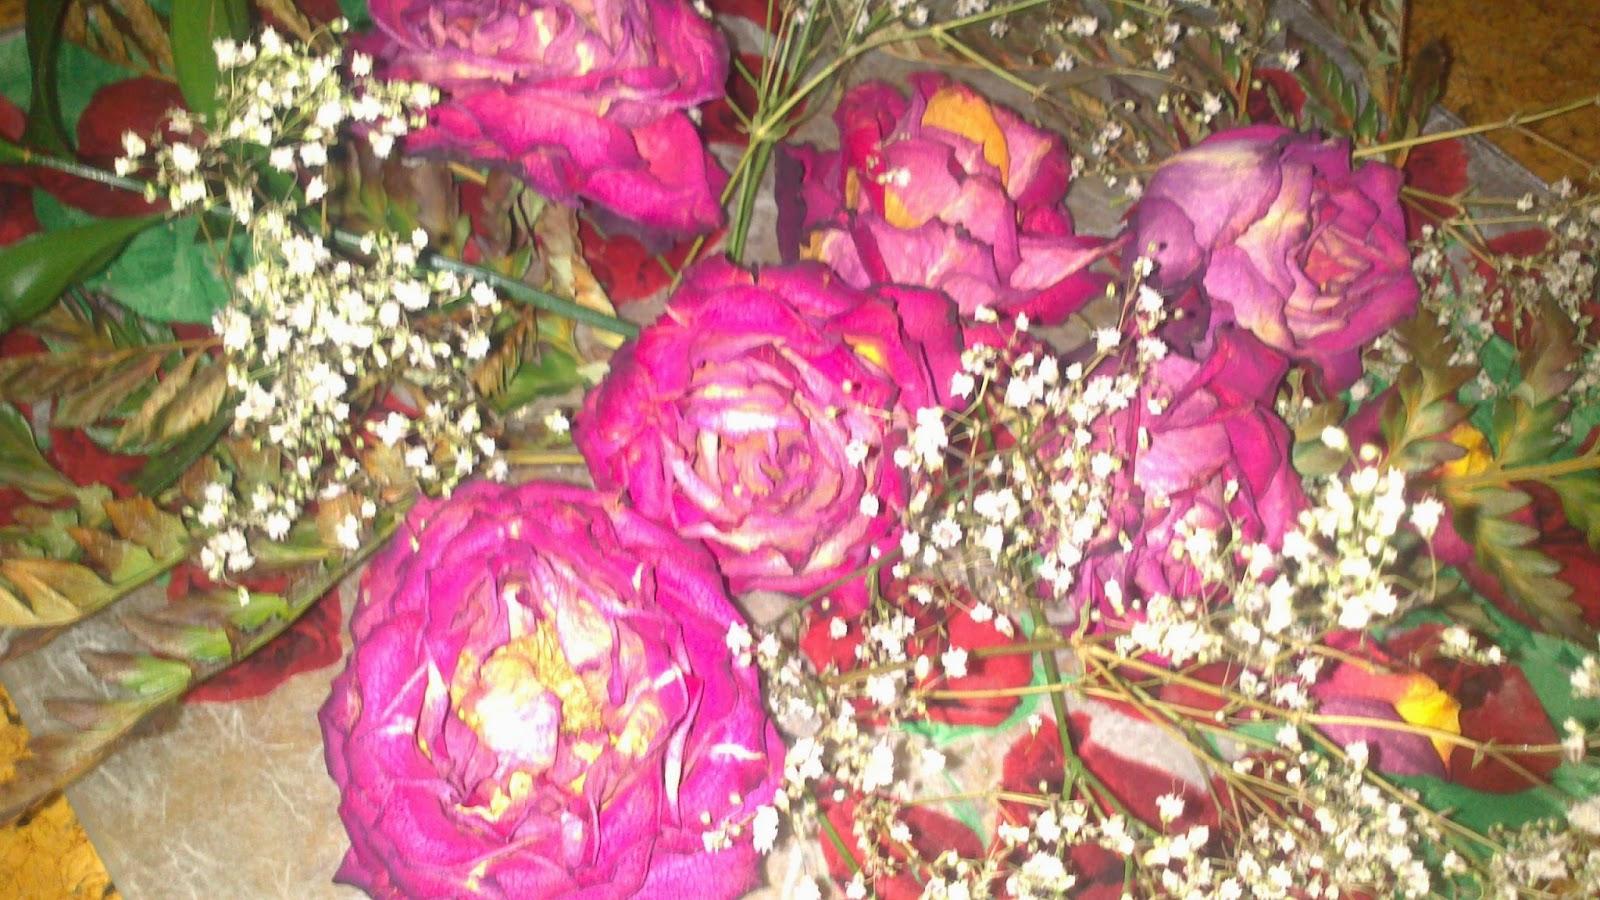 flores rosas naturales Descargar Fotos gratis Freepik - Ramos De Rosas Naturales Imagenes